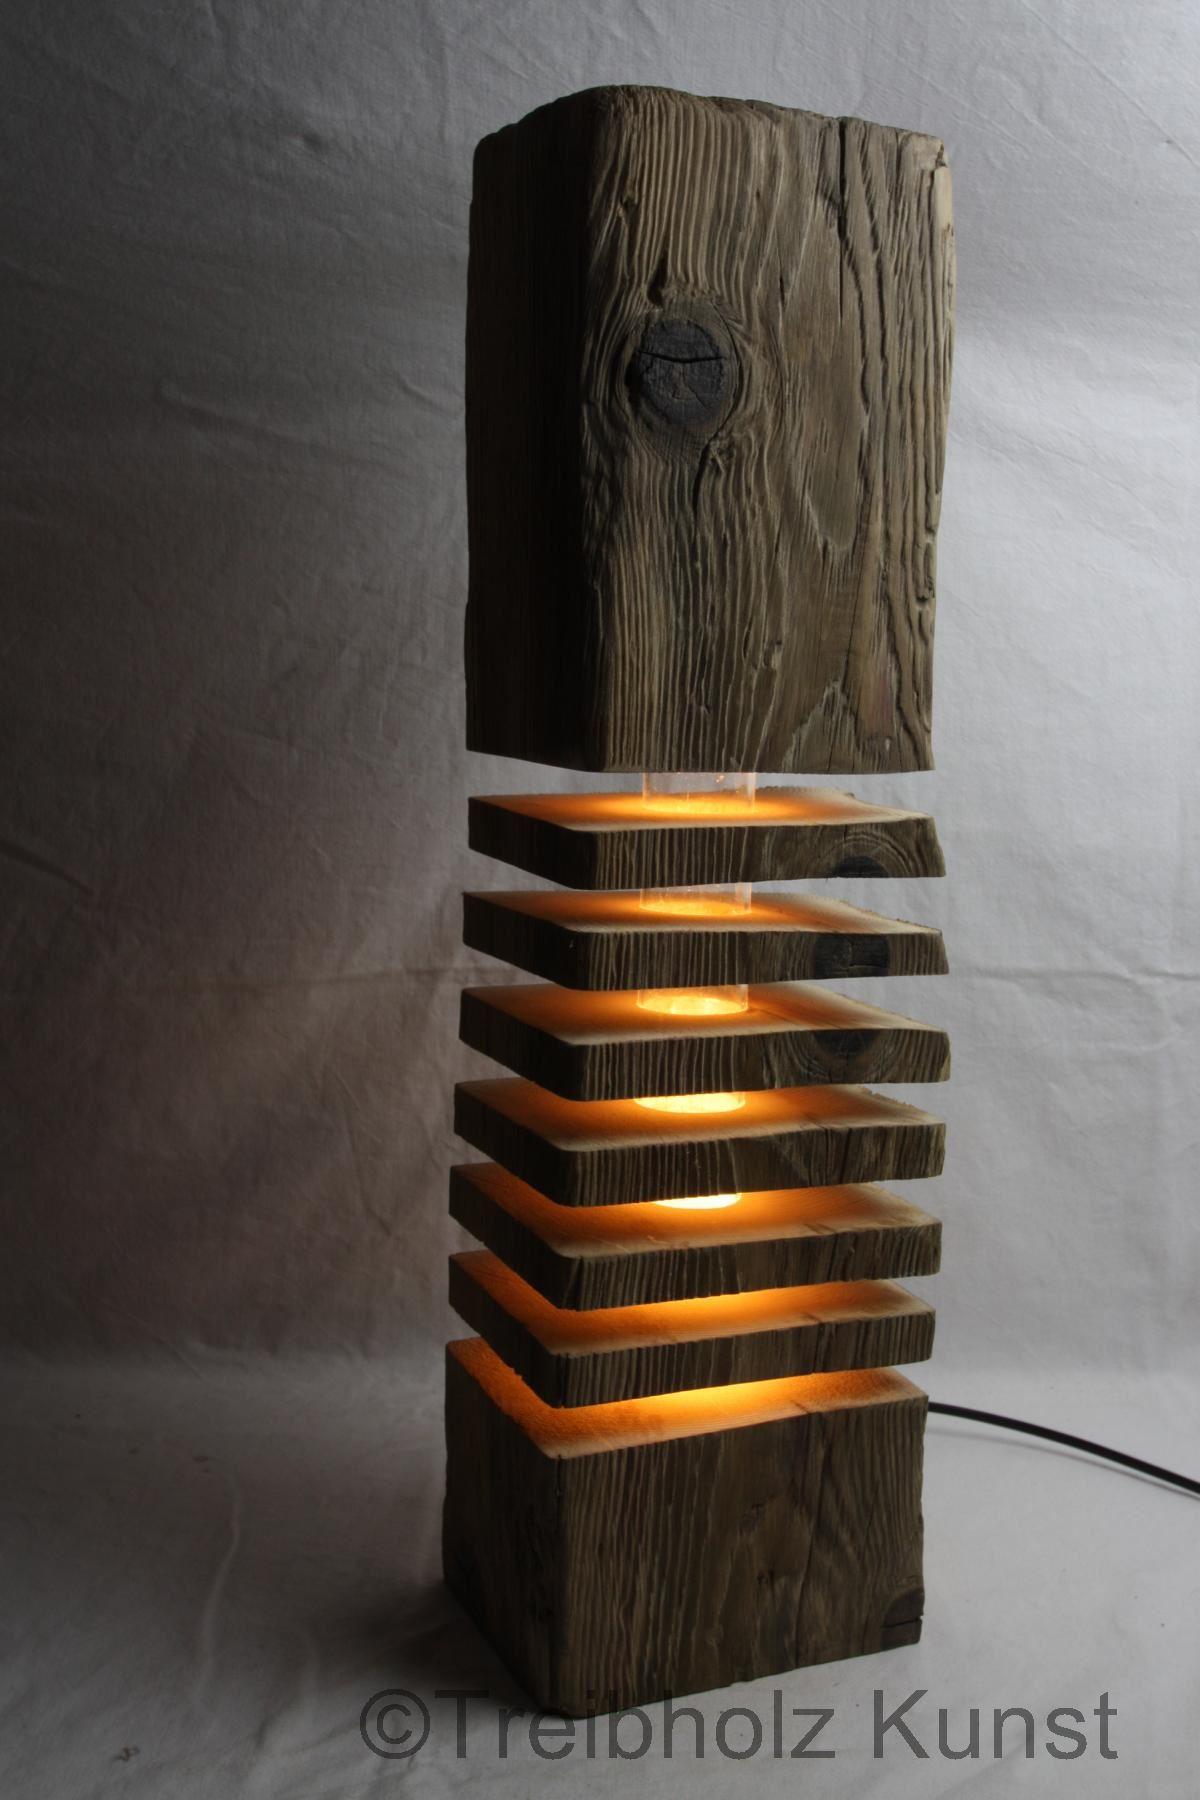 Treibholz altholz designlampe for Designer lampen wohnzimmer